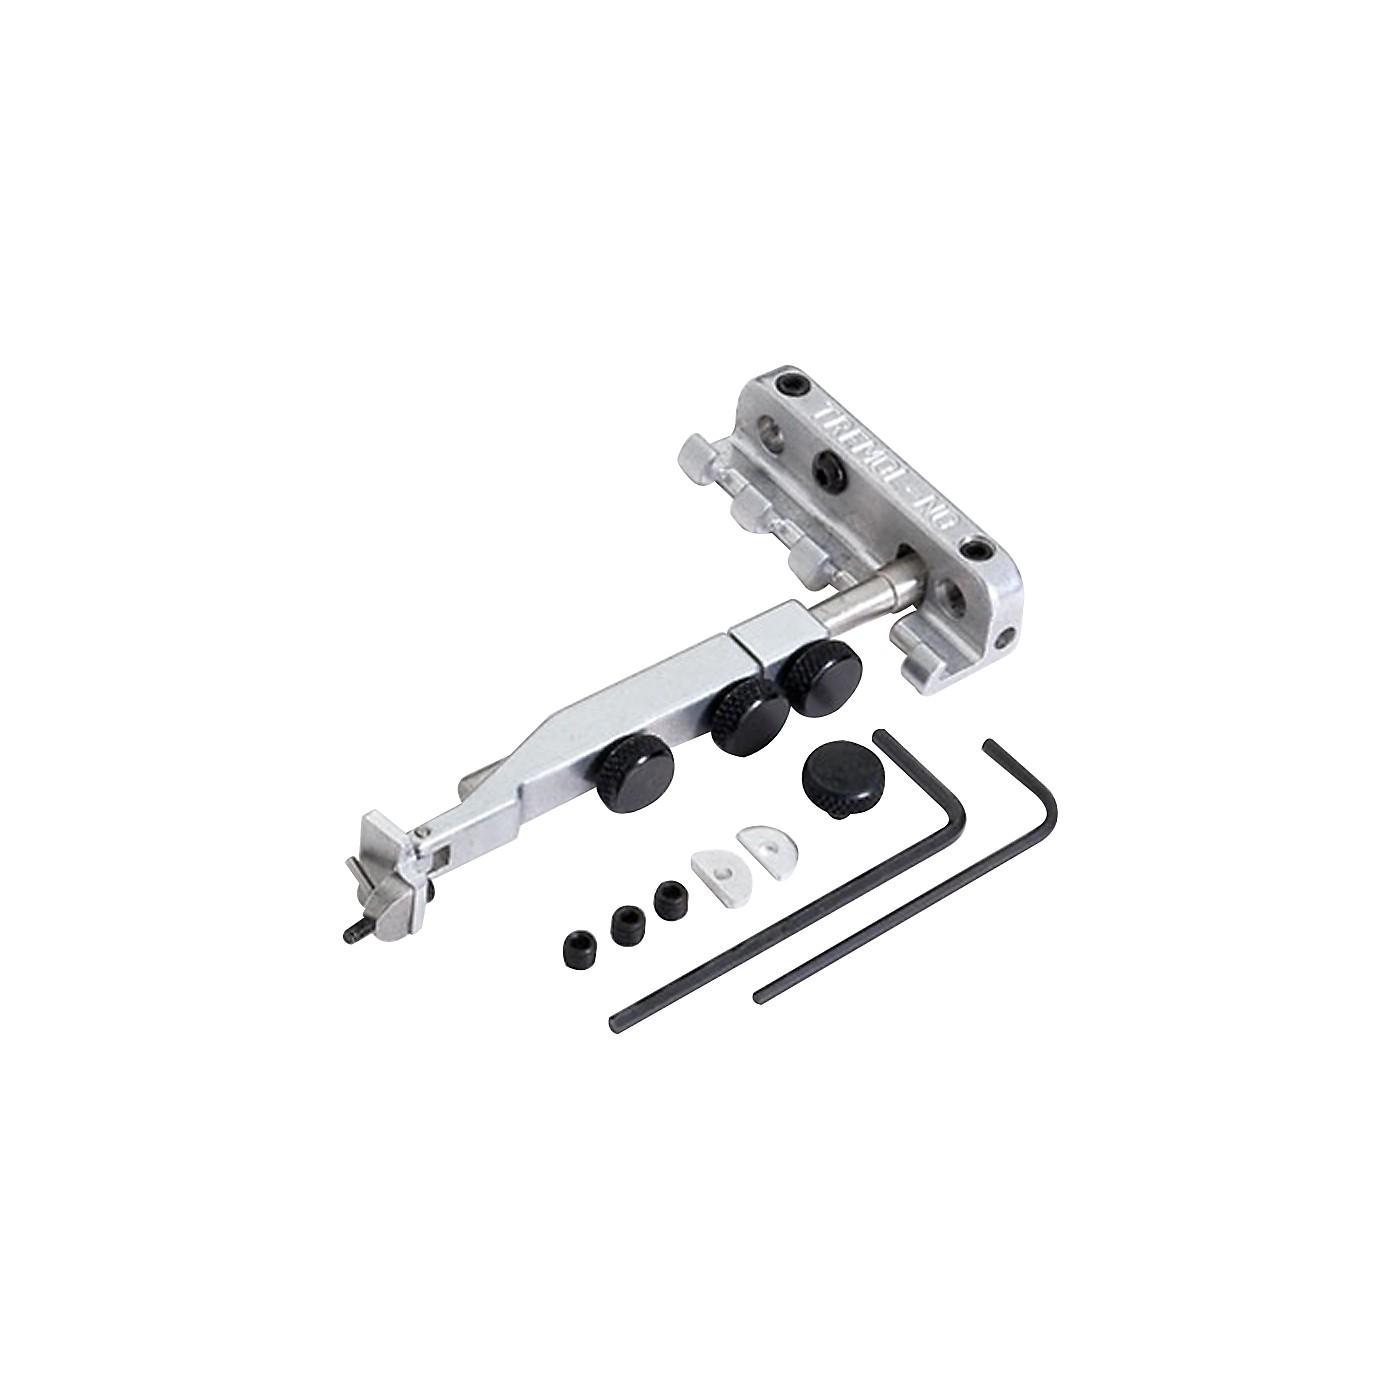 Allparts Tremol-No Tremolo Locking Device - Pin Type thumbnail